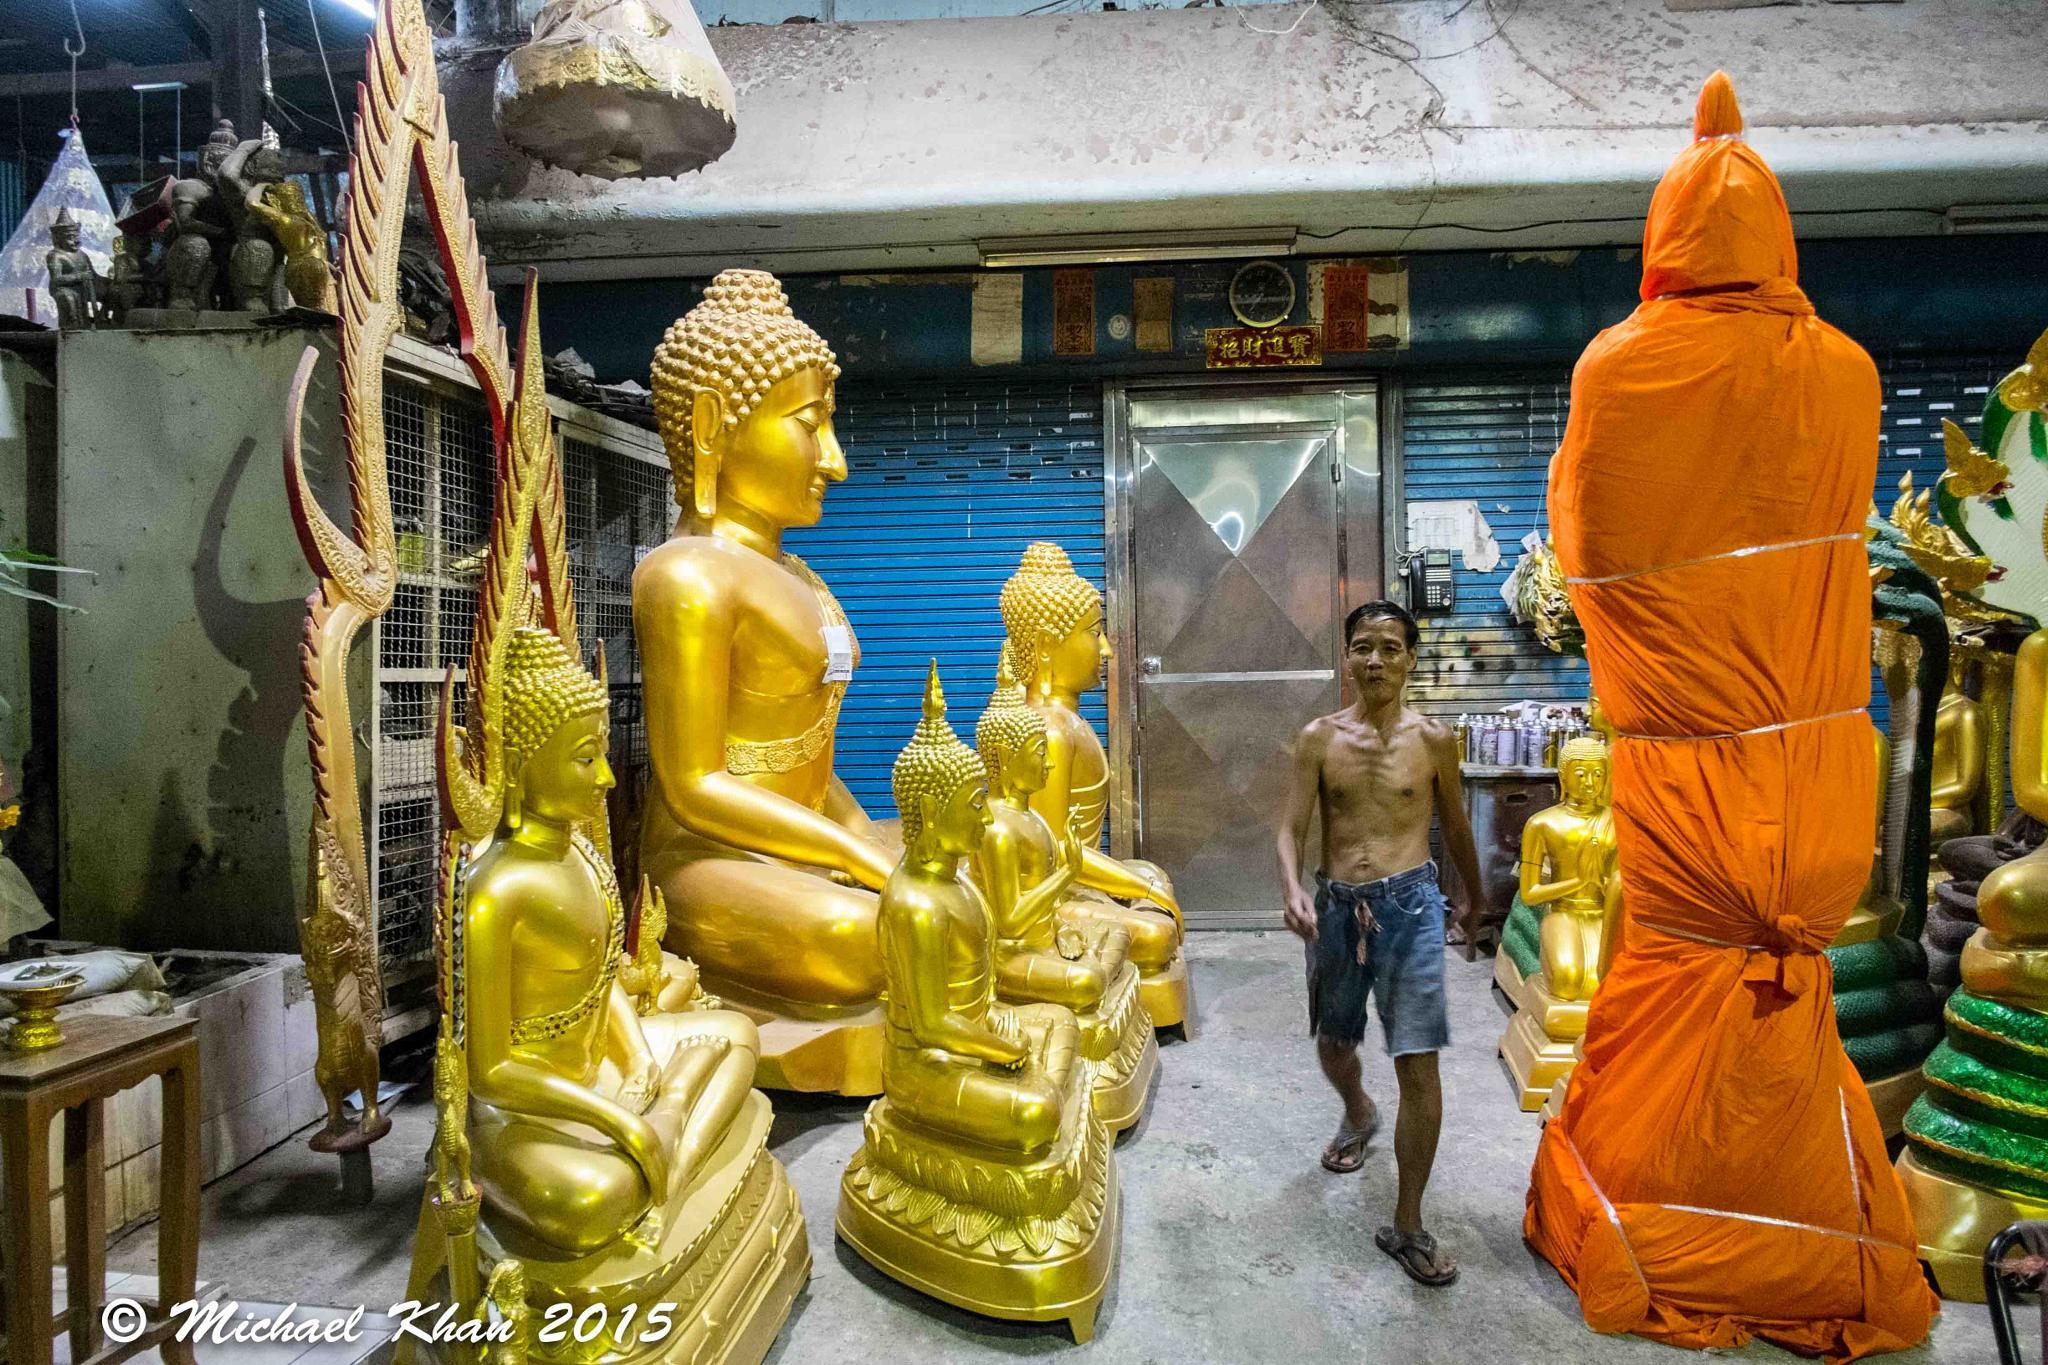 Buddha alley by Michael Khan